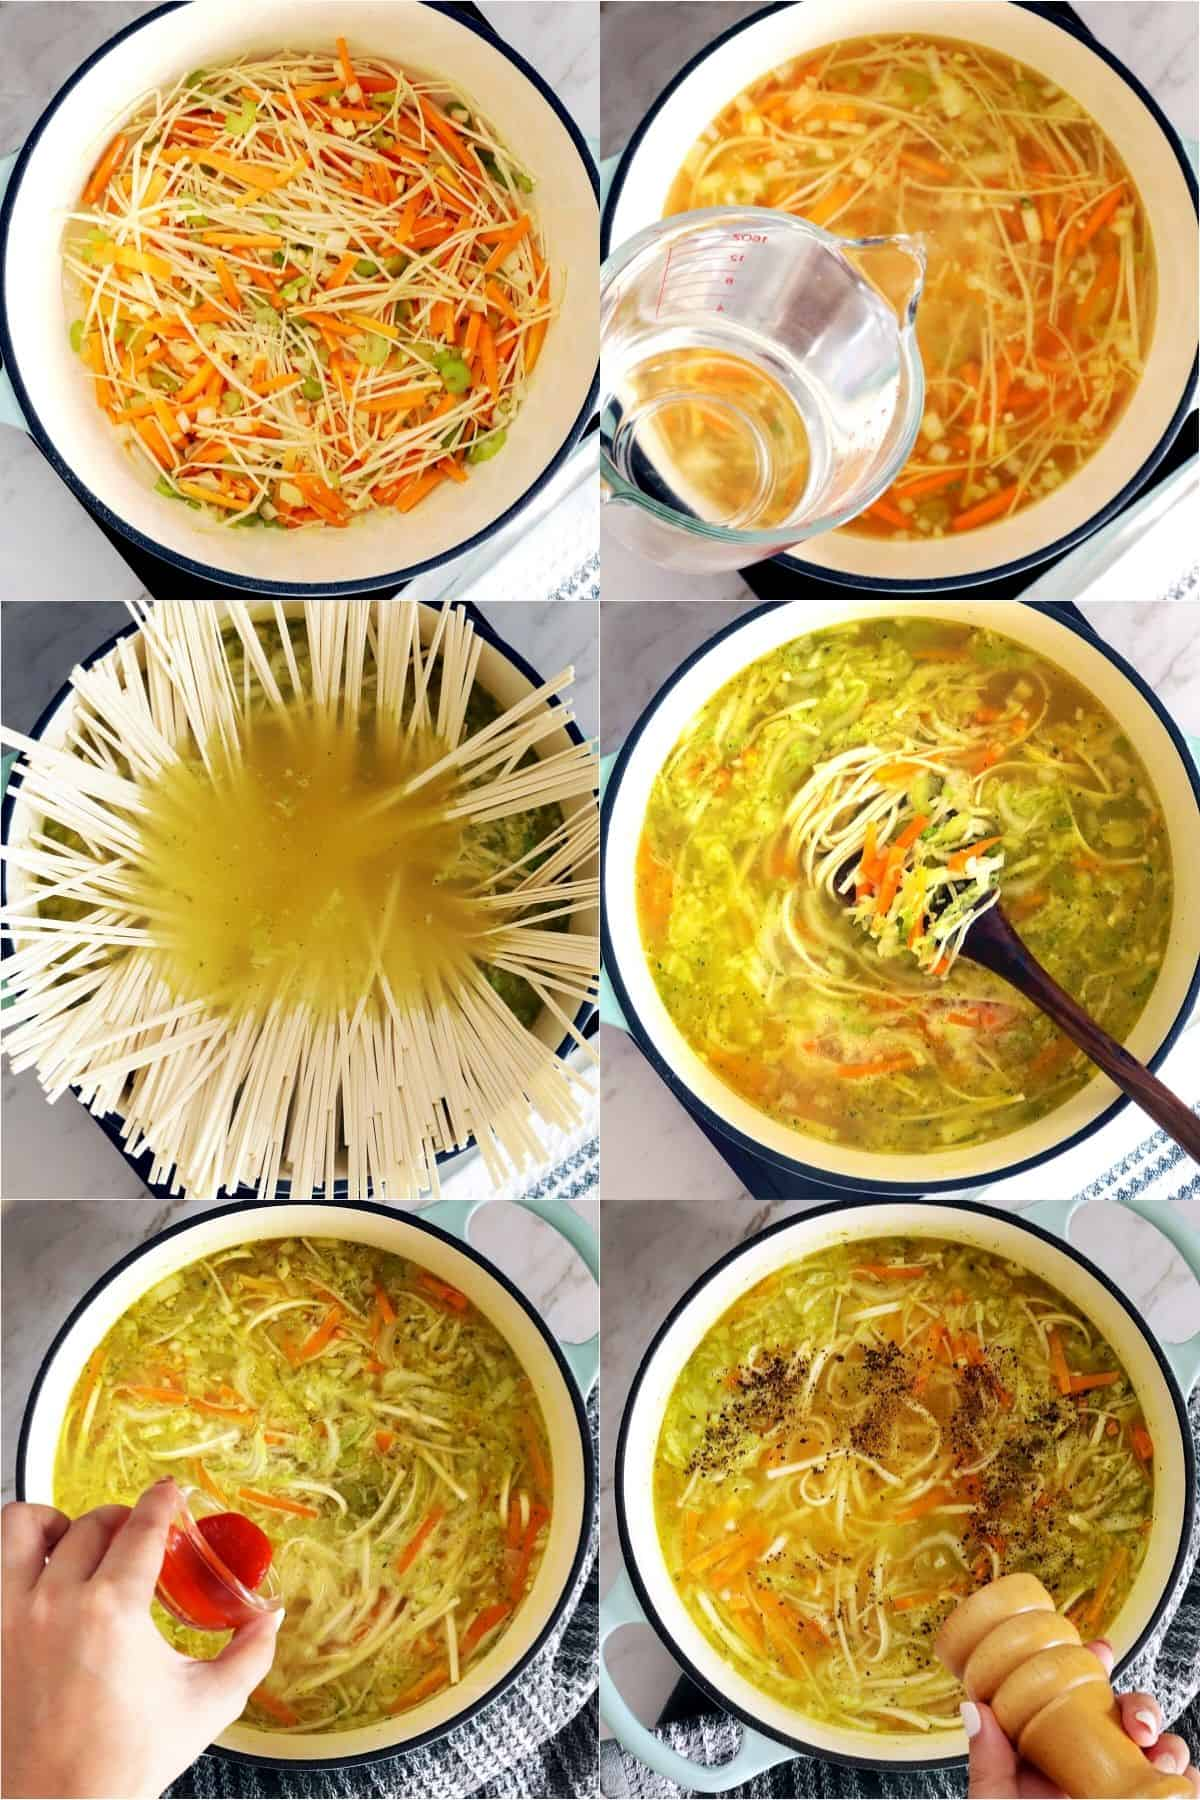 6 process photos of cooking udon noodle soup.